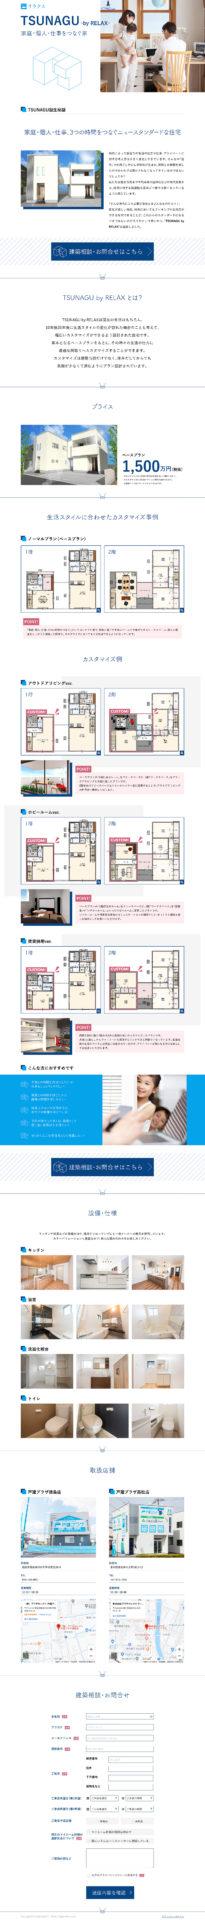 TSUNAGU -by RELAX- 家庭・個人・仕事をつなぐ家のキャプチャ